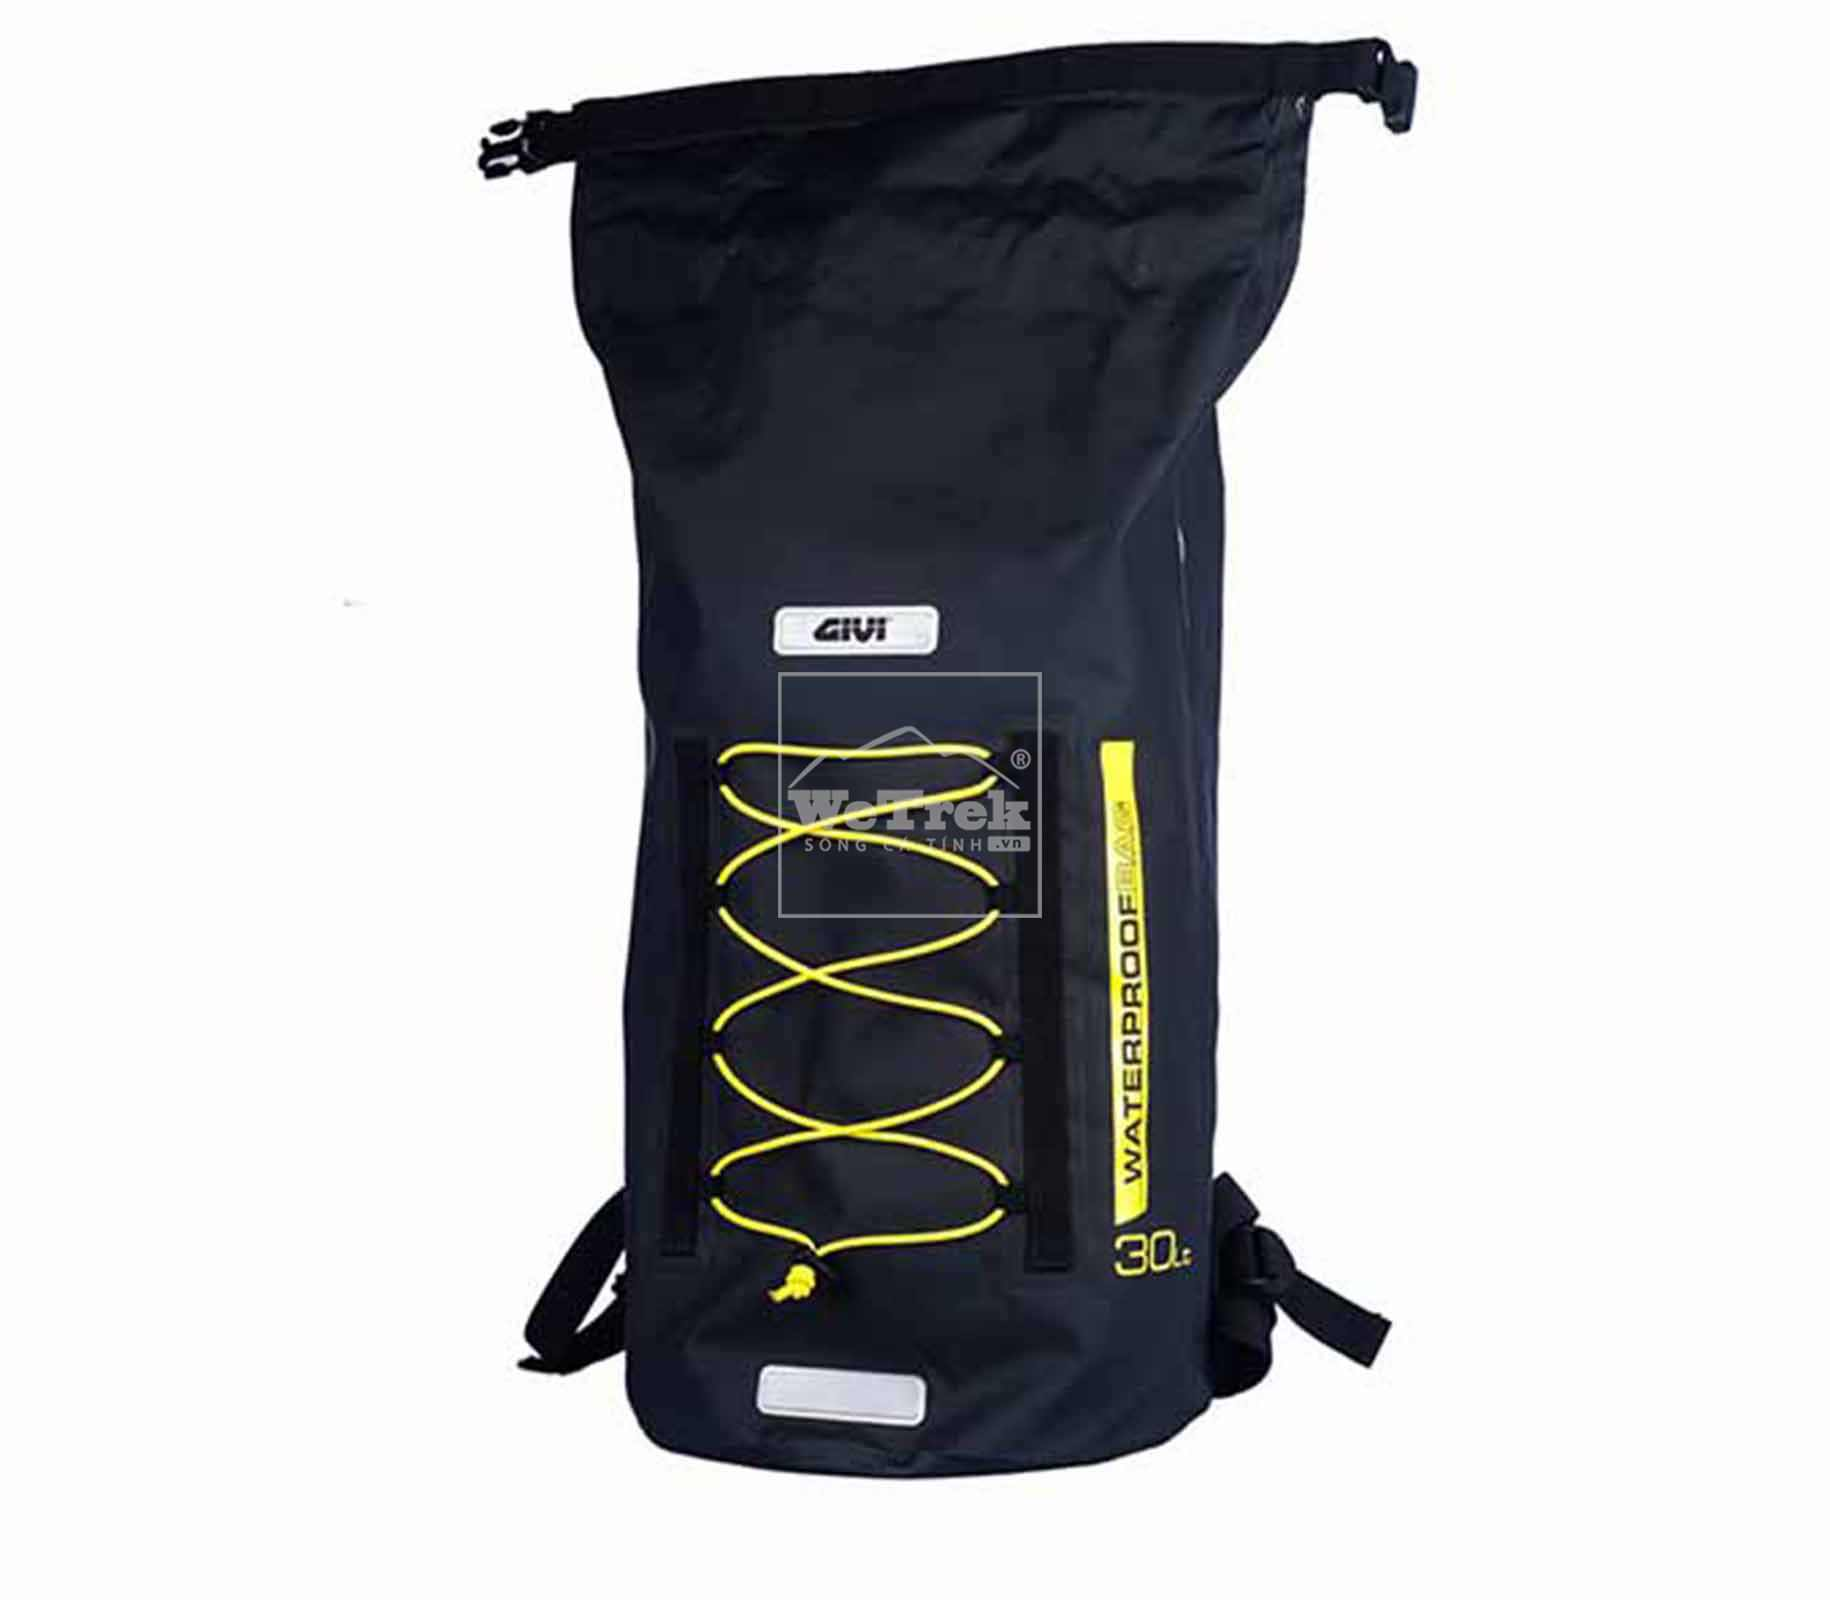 balo-chong-nuoc-30L-givi-prime-backpack-pbp01-wetrek.vn-3